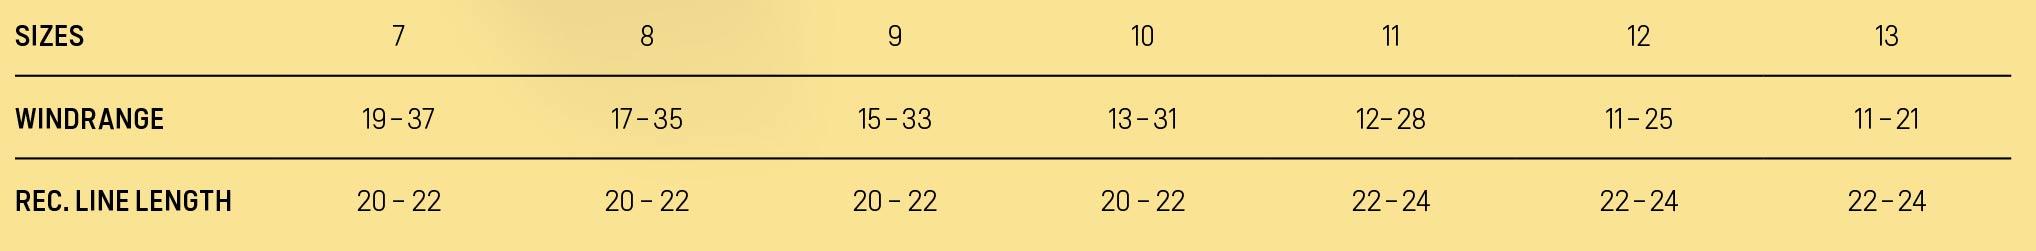 plage-de-vent-ale-de-kite-dice-sls-2022-duotone-kiteboarding